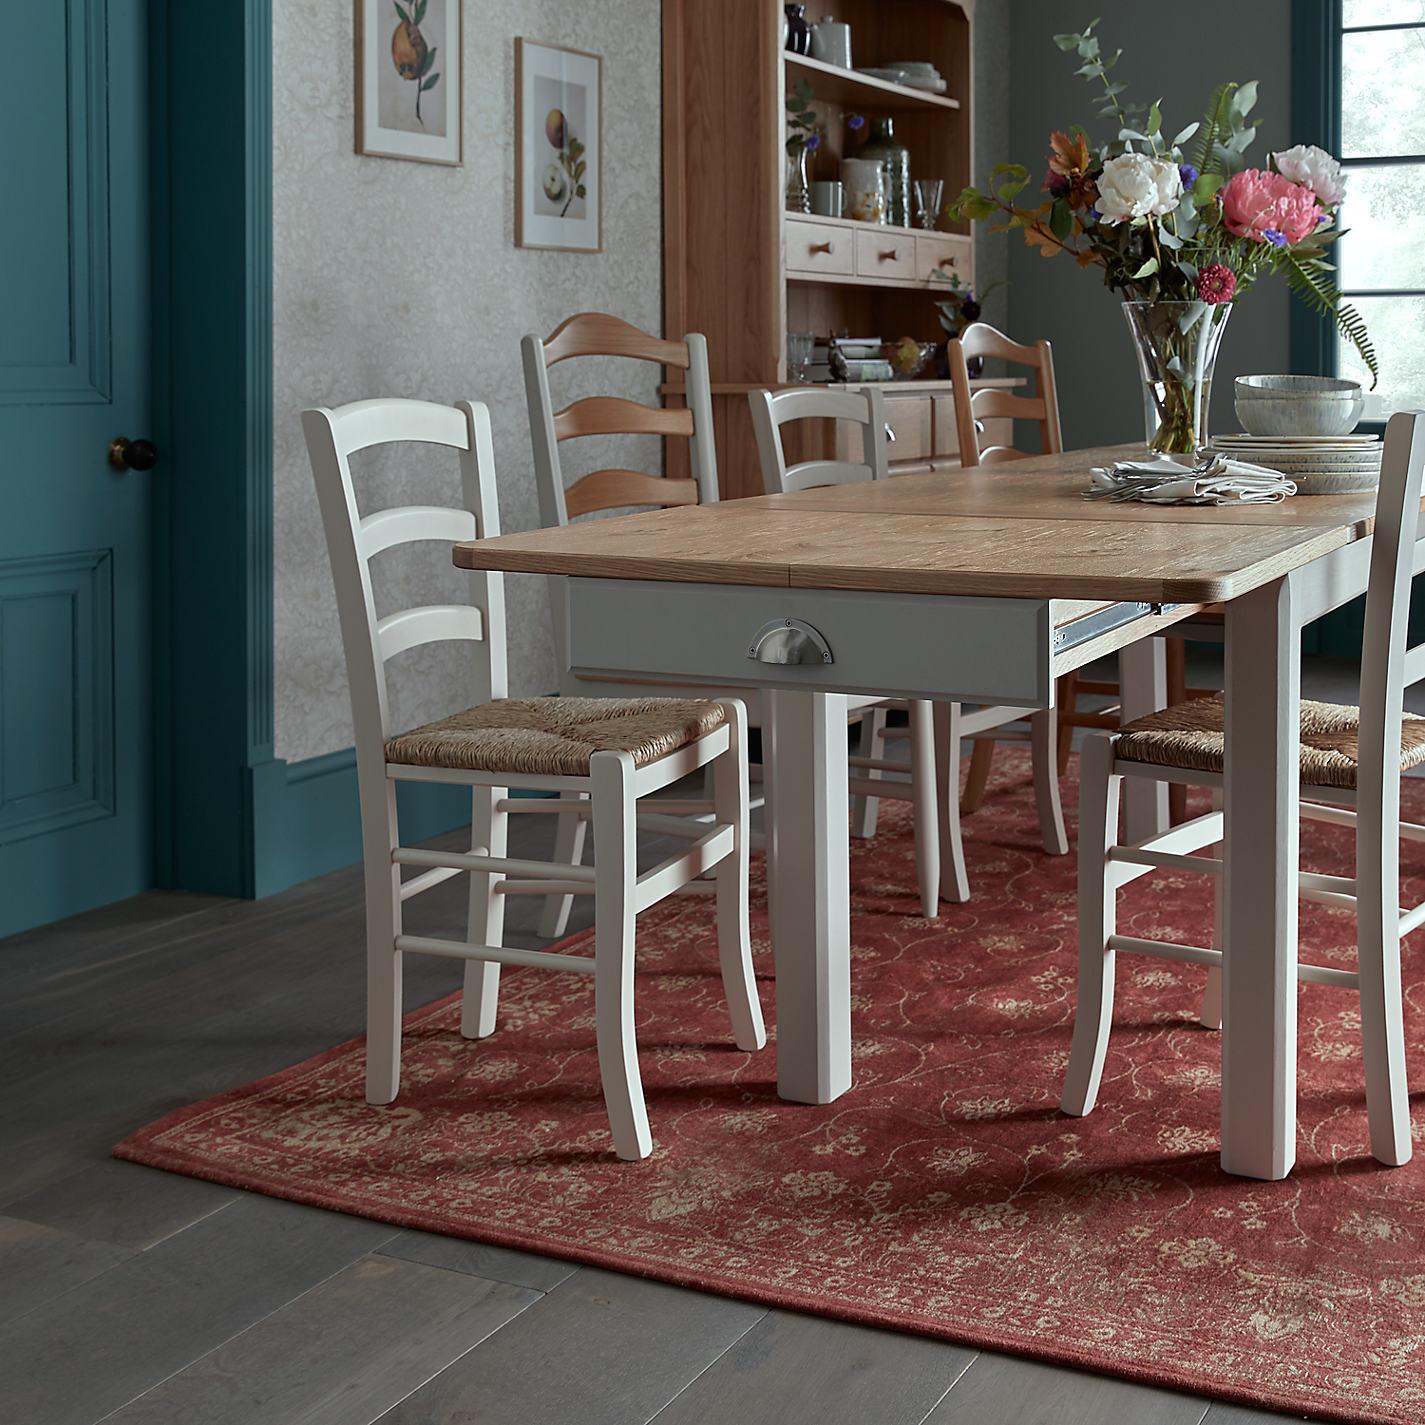 Scintillating John Lewis Dining Room Table Photos Best  : AW17LIVDINAUDLEYalt18prodexlrg from extrasoft.us size 1425 x 1425 jpeg 320kB